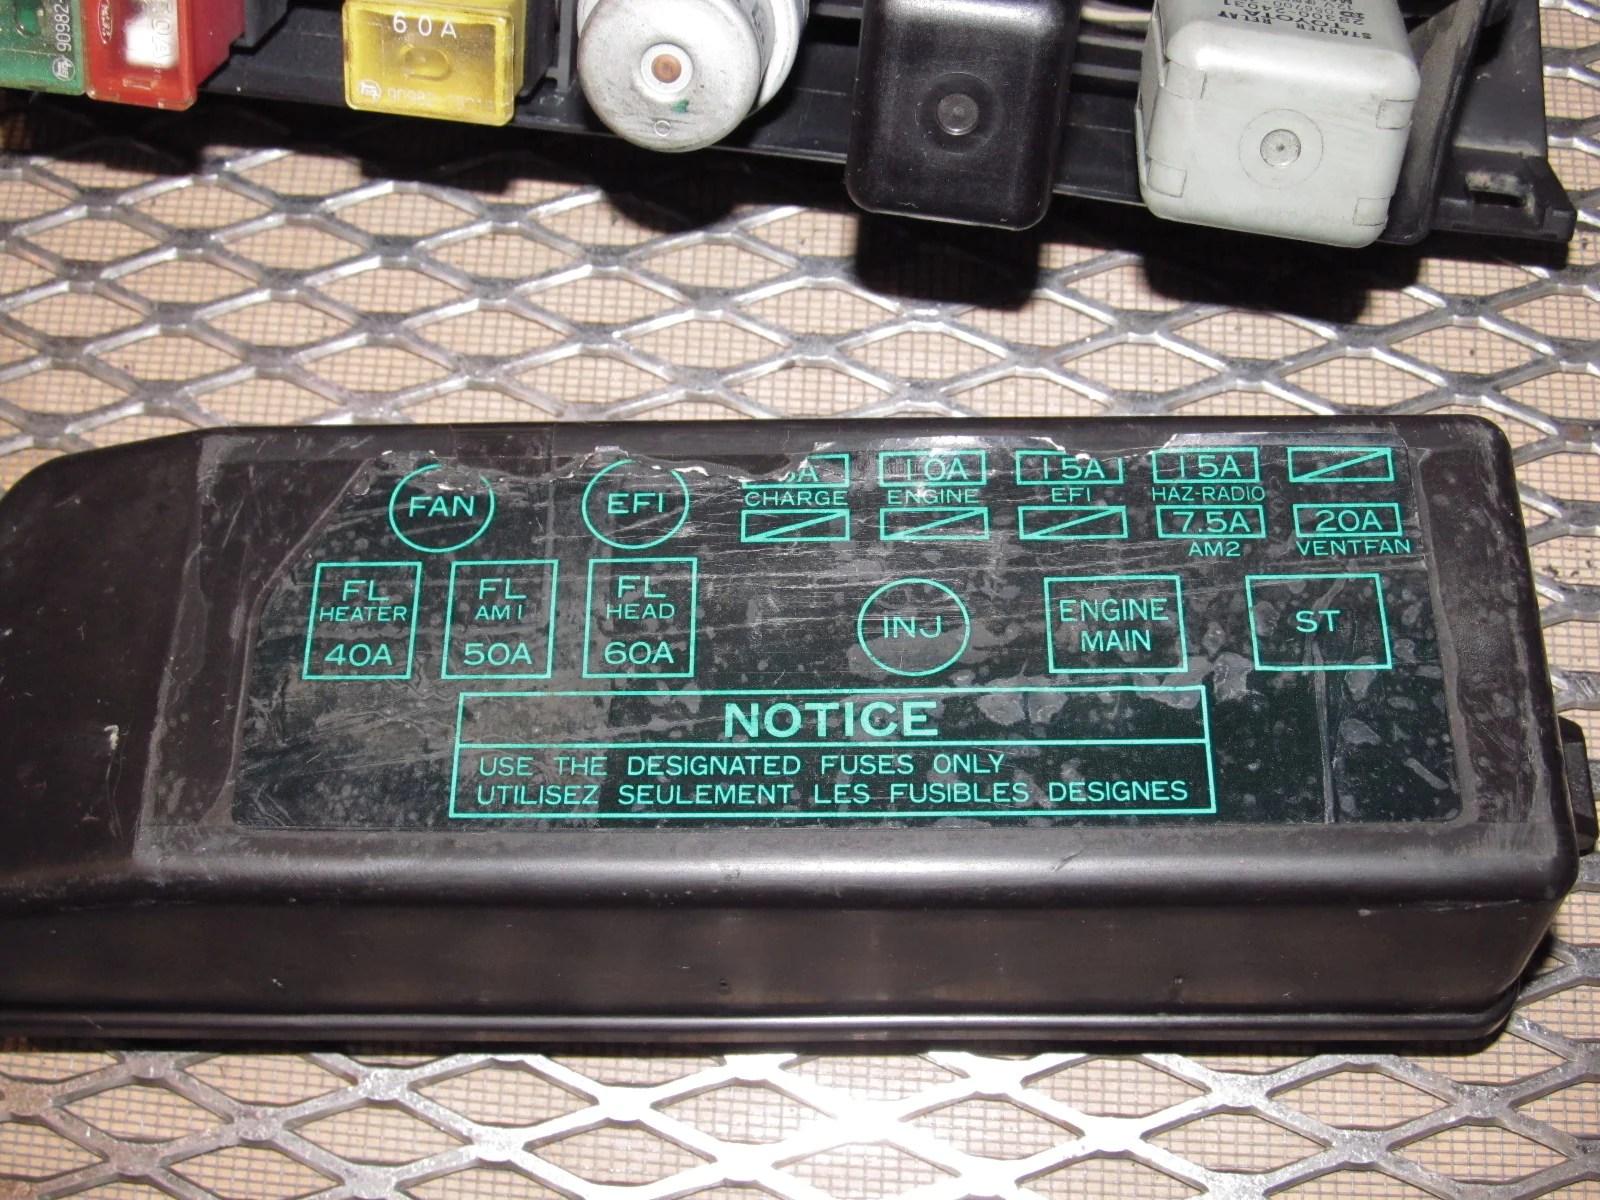 87 88 89 toyota mr2 oem engine fuse box  [ 1600 x 1200 Pixel ]